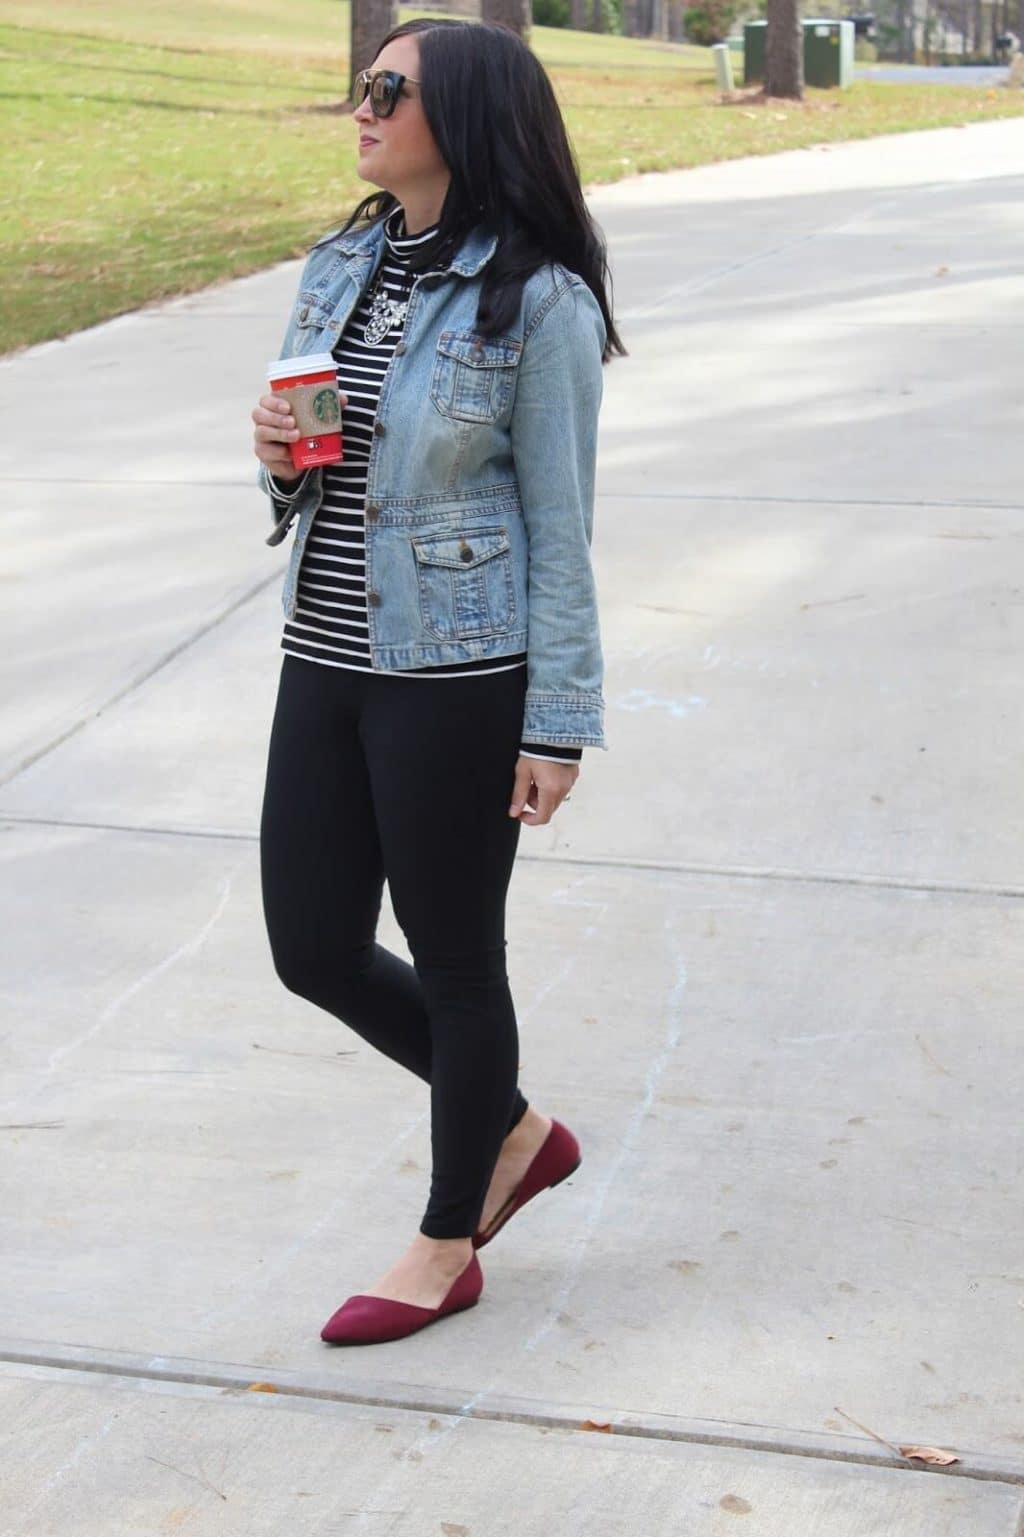 Prada Sunglasses, Statement necklace, Striped turtleneck, denim jacket